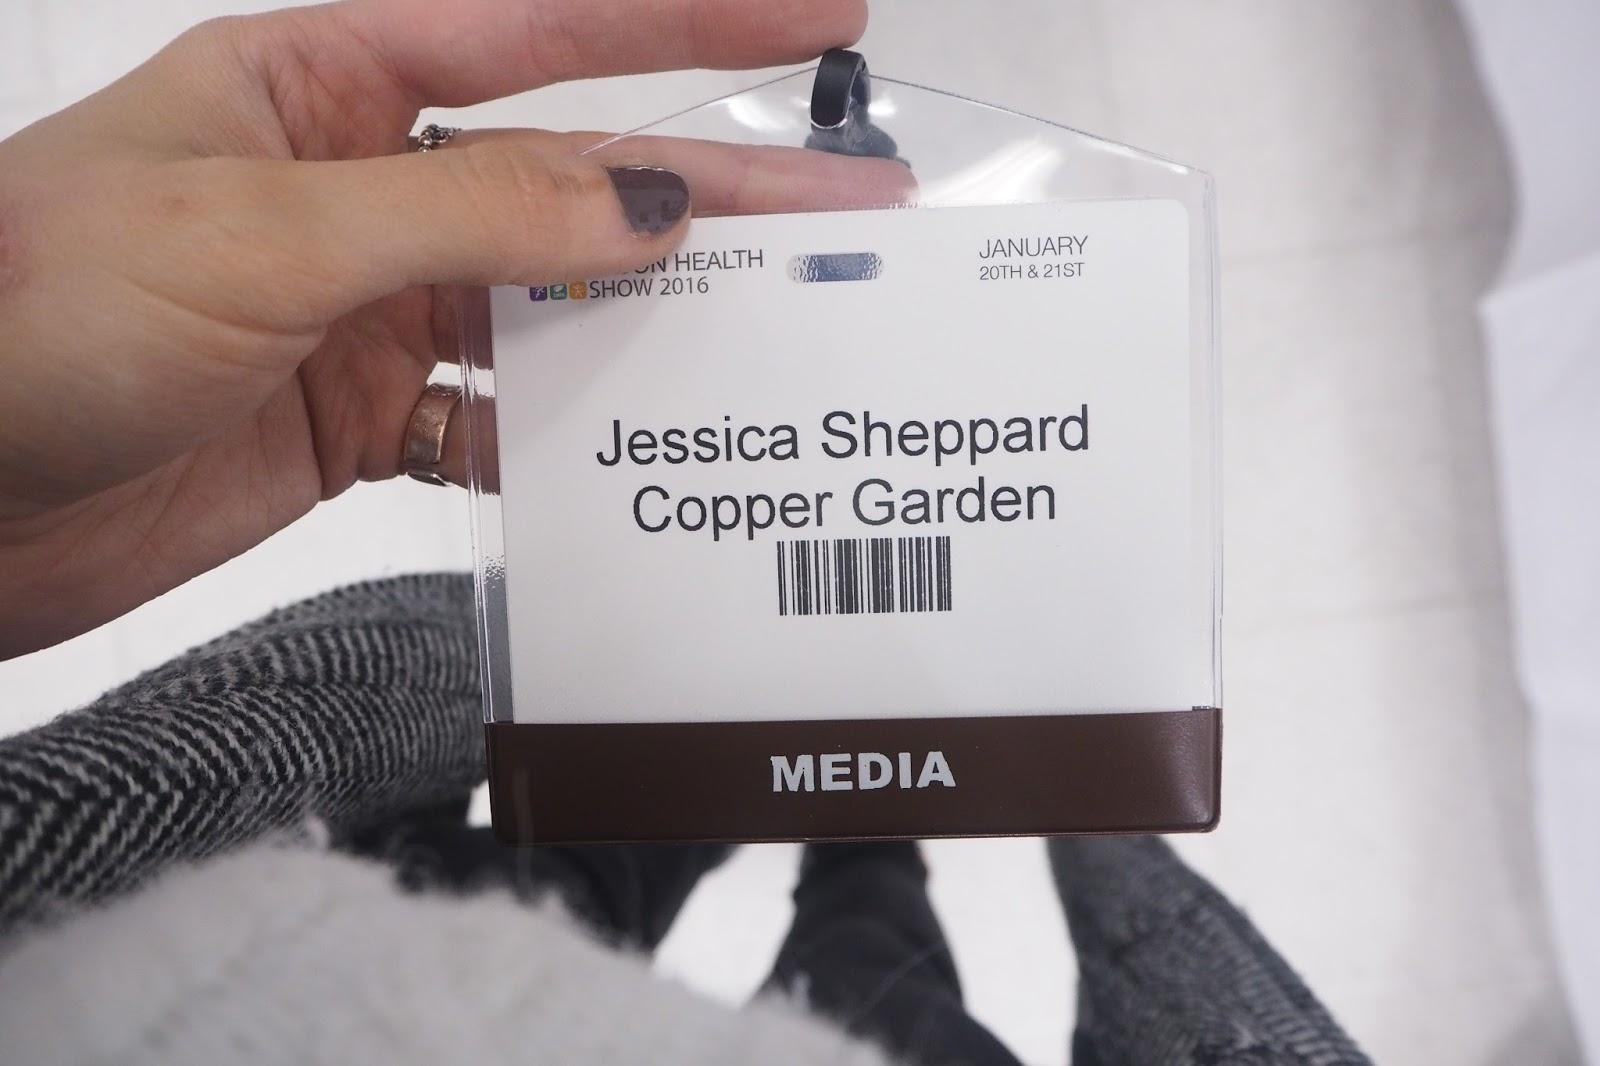 london-health-show-vegan-copper-garden